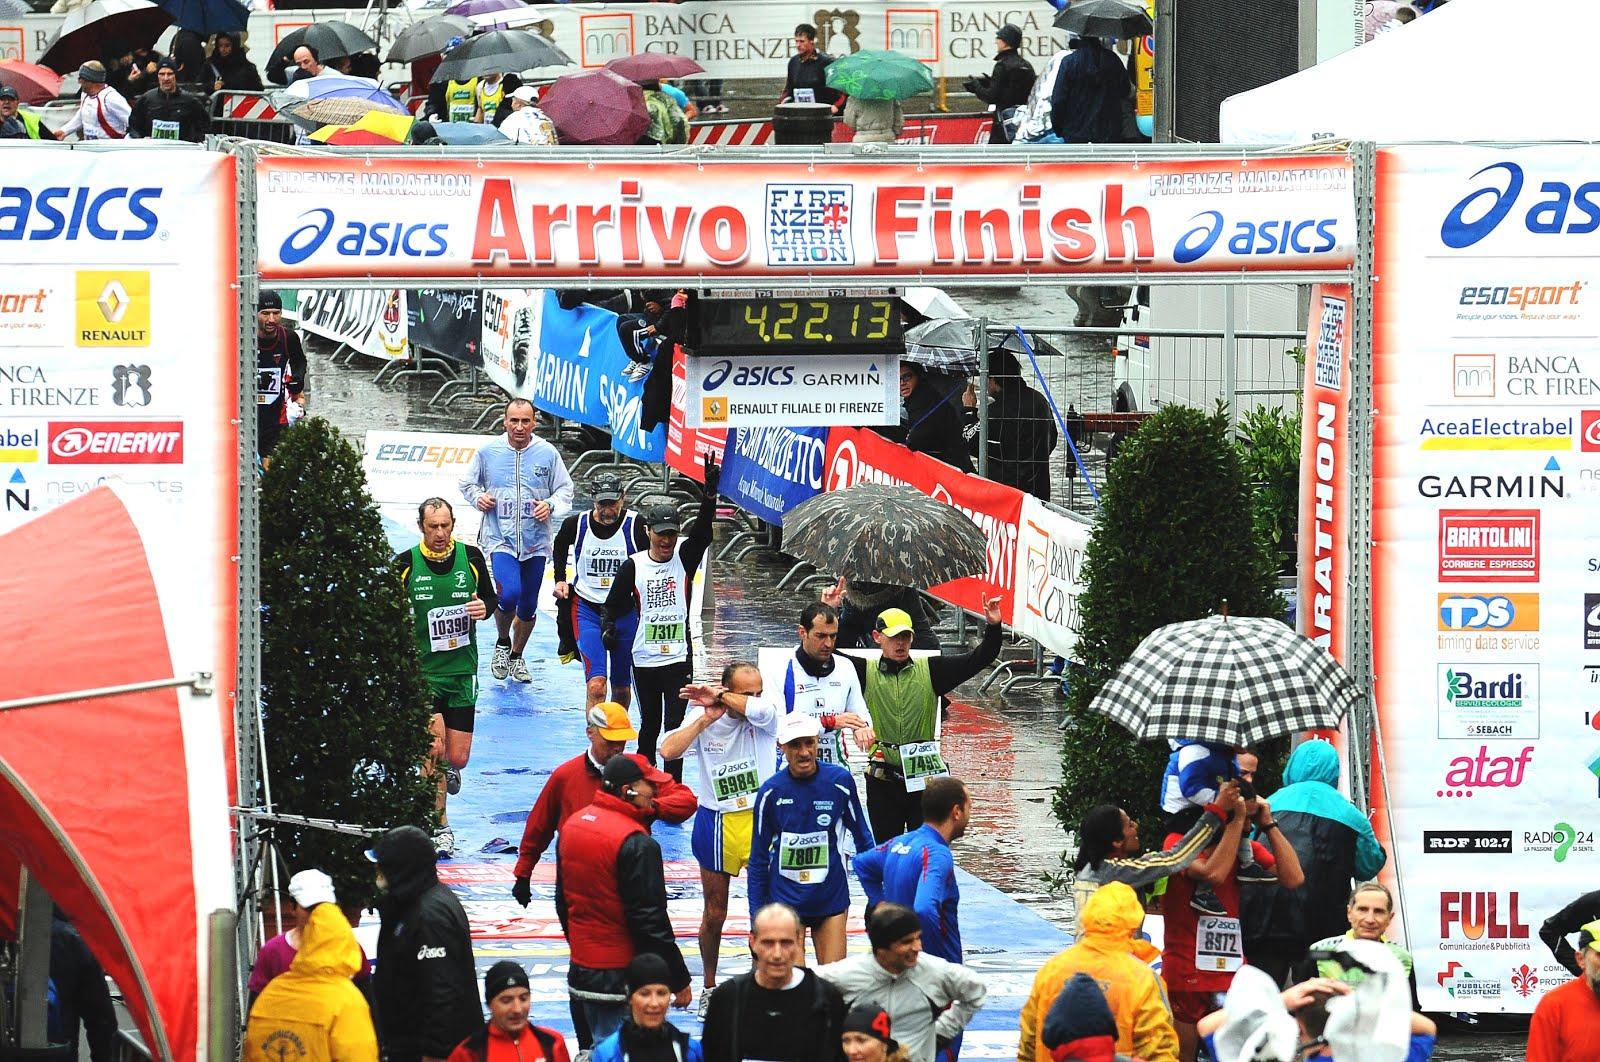 Maratona de Florença 2010